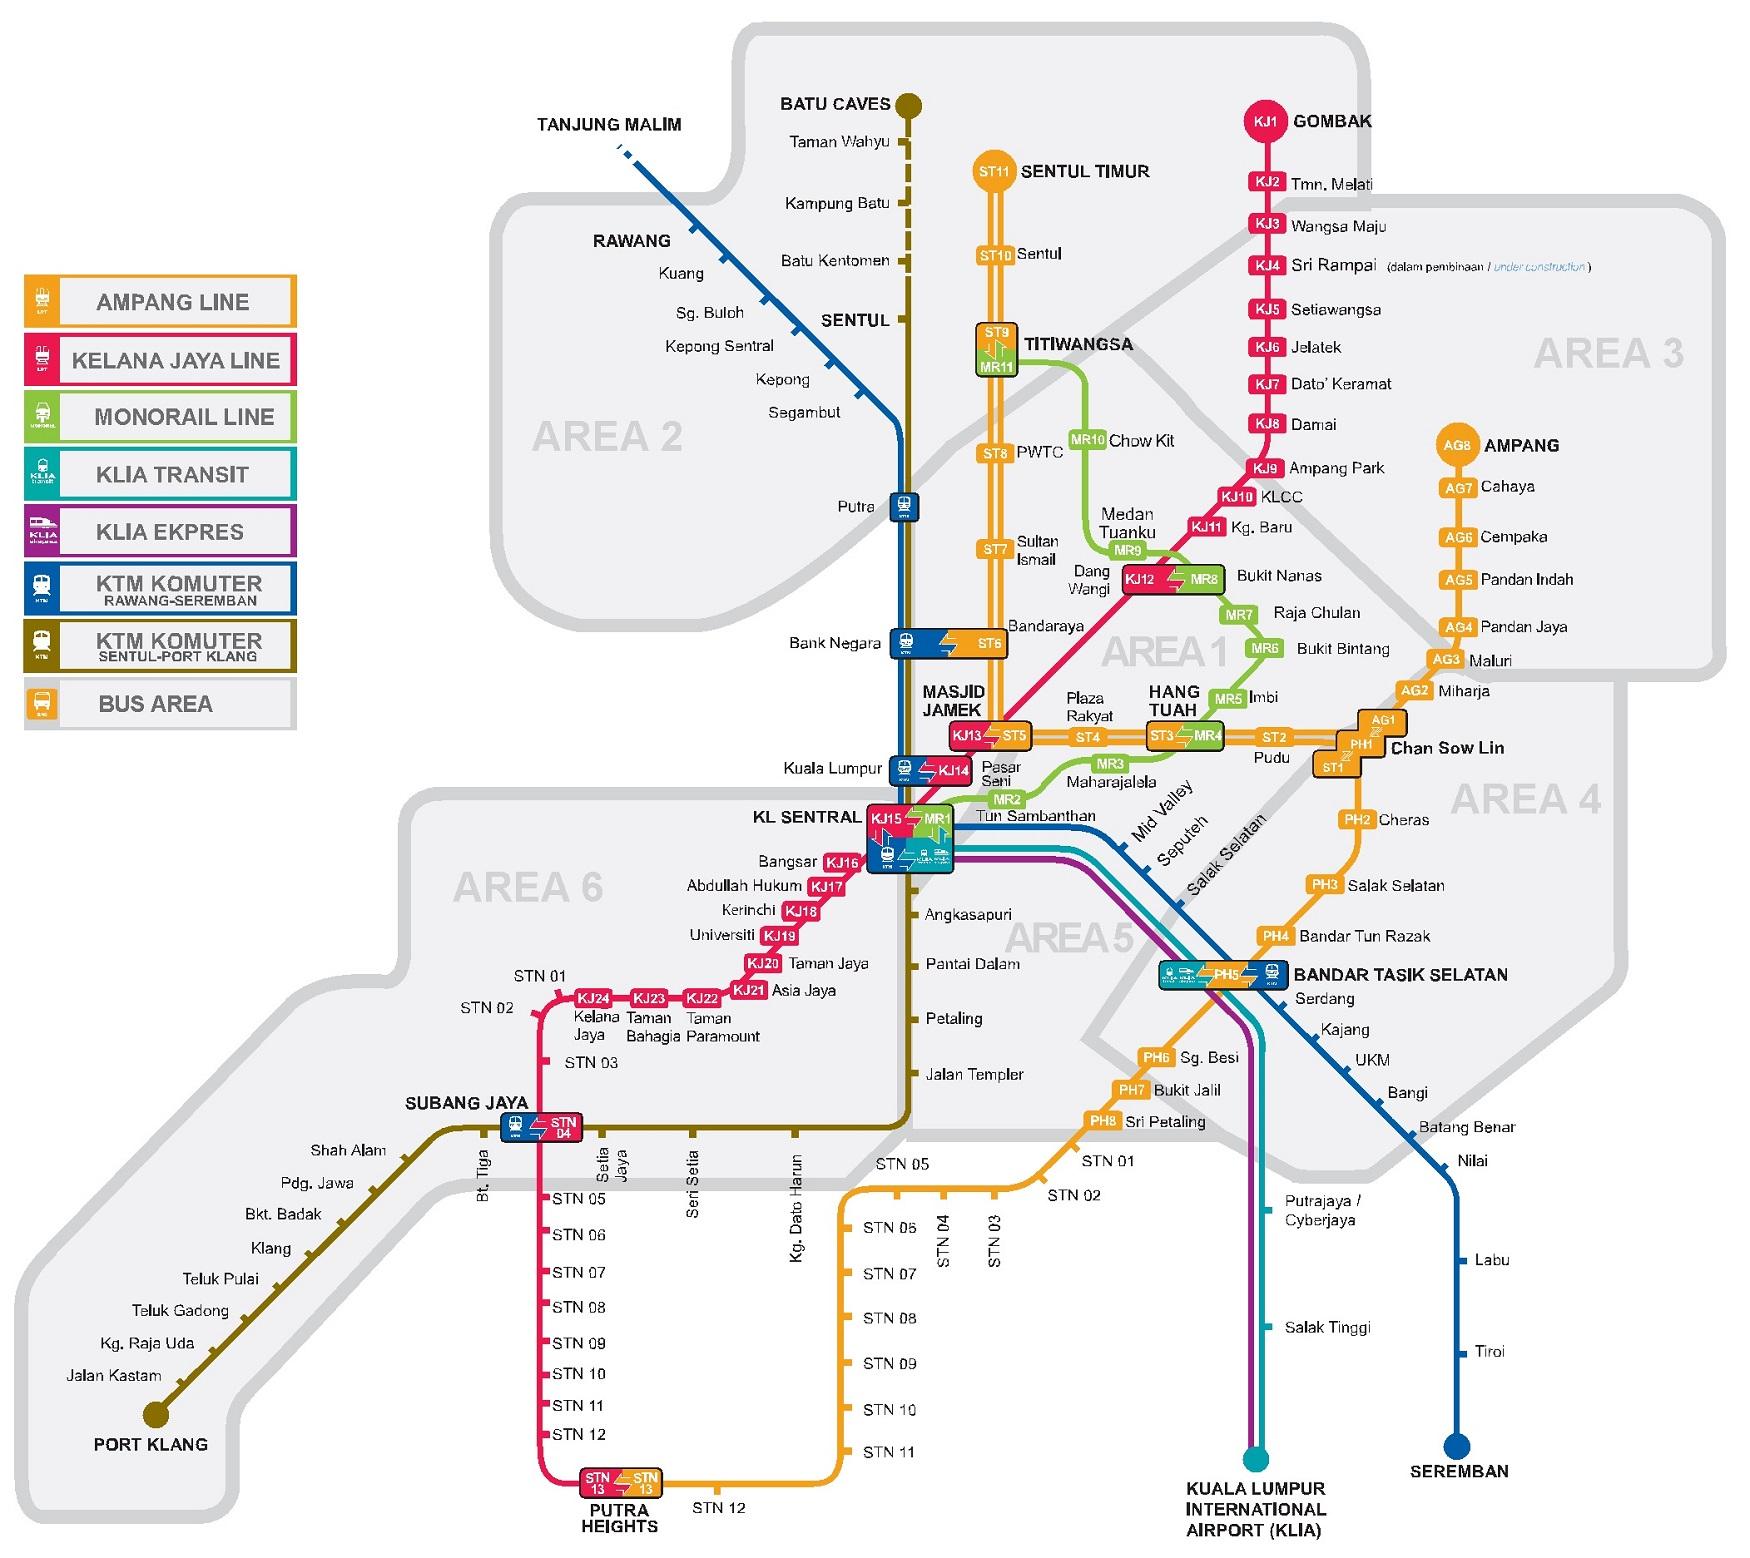 Схема монорельсовой дороги и метро Куала-Лумпура